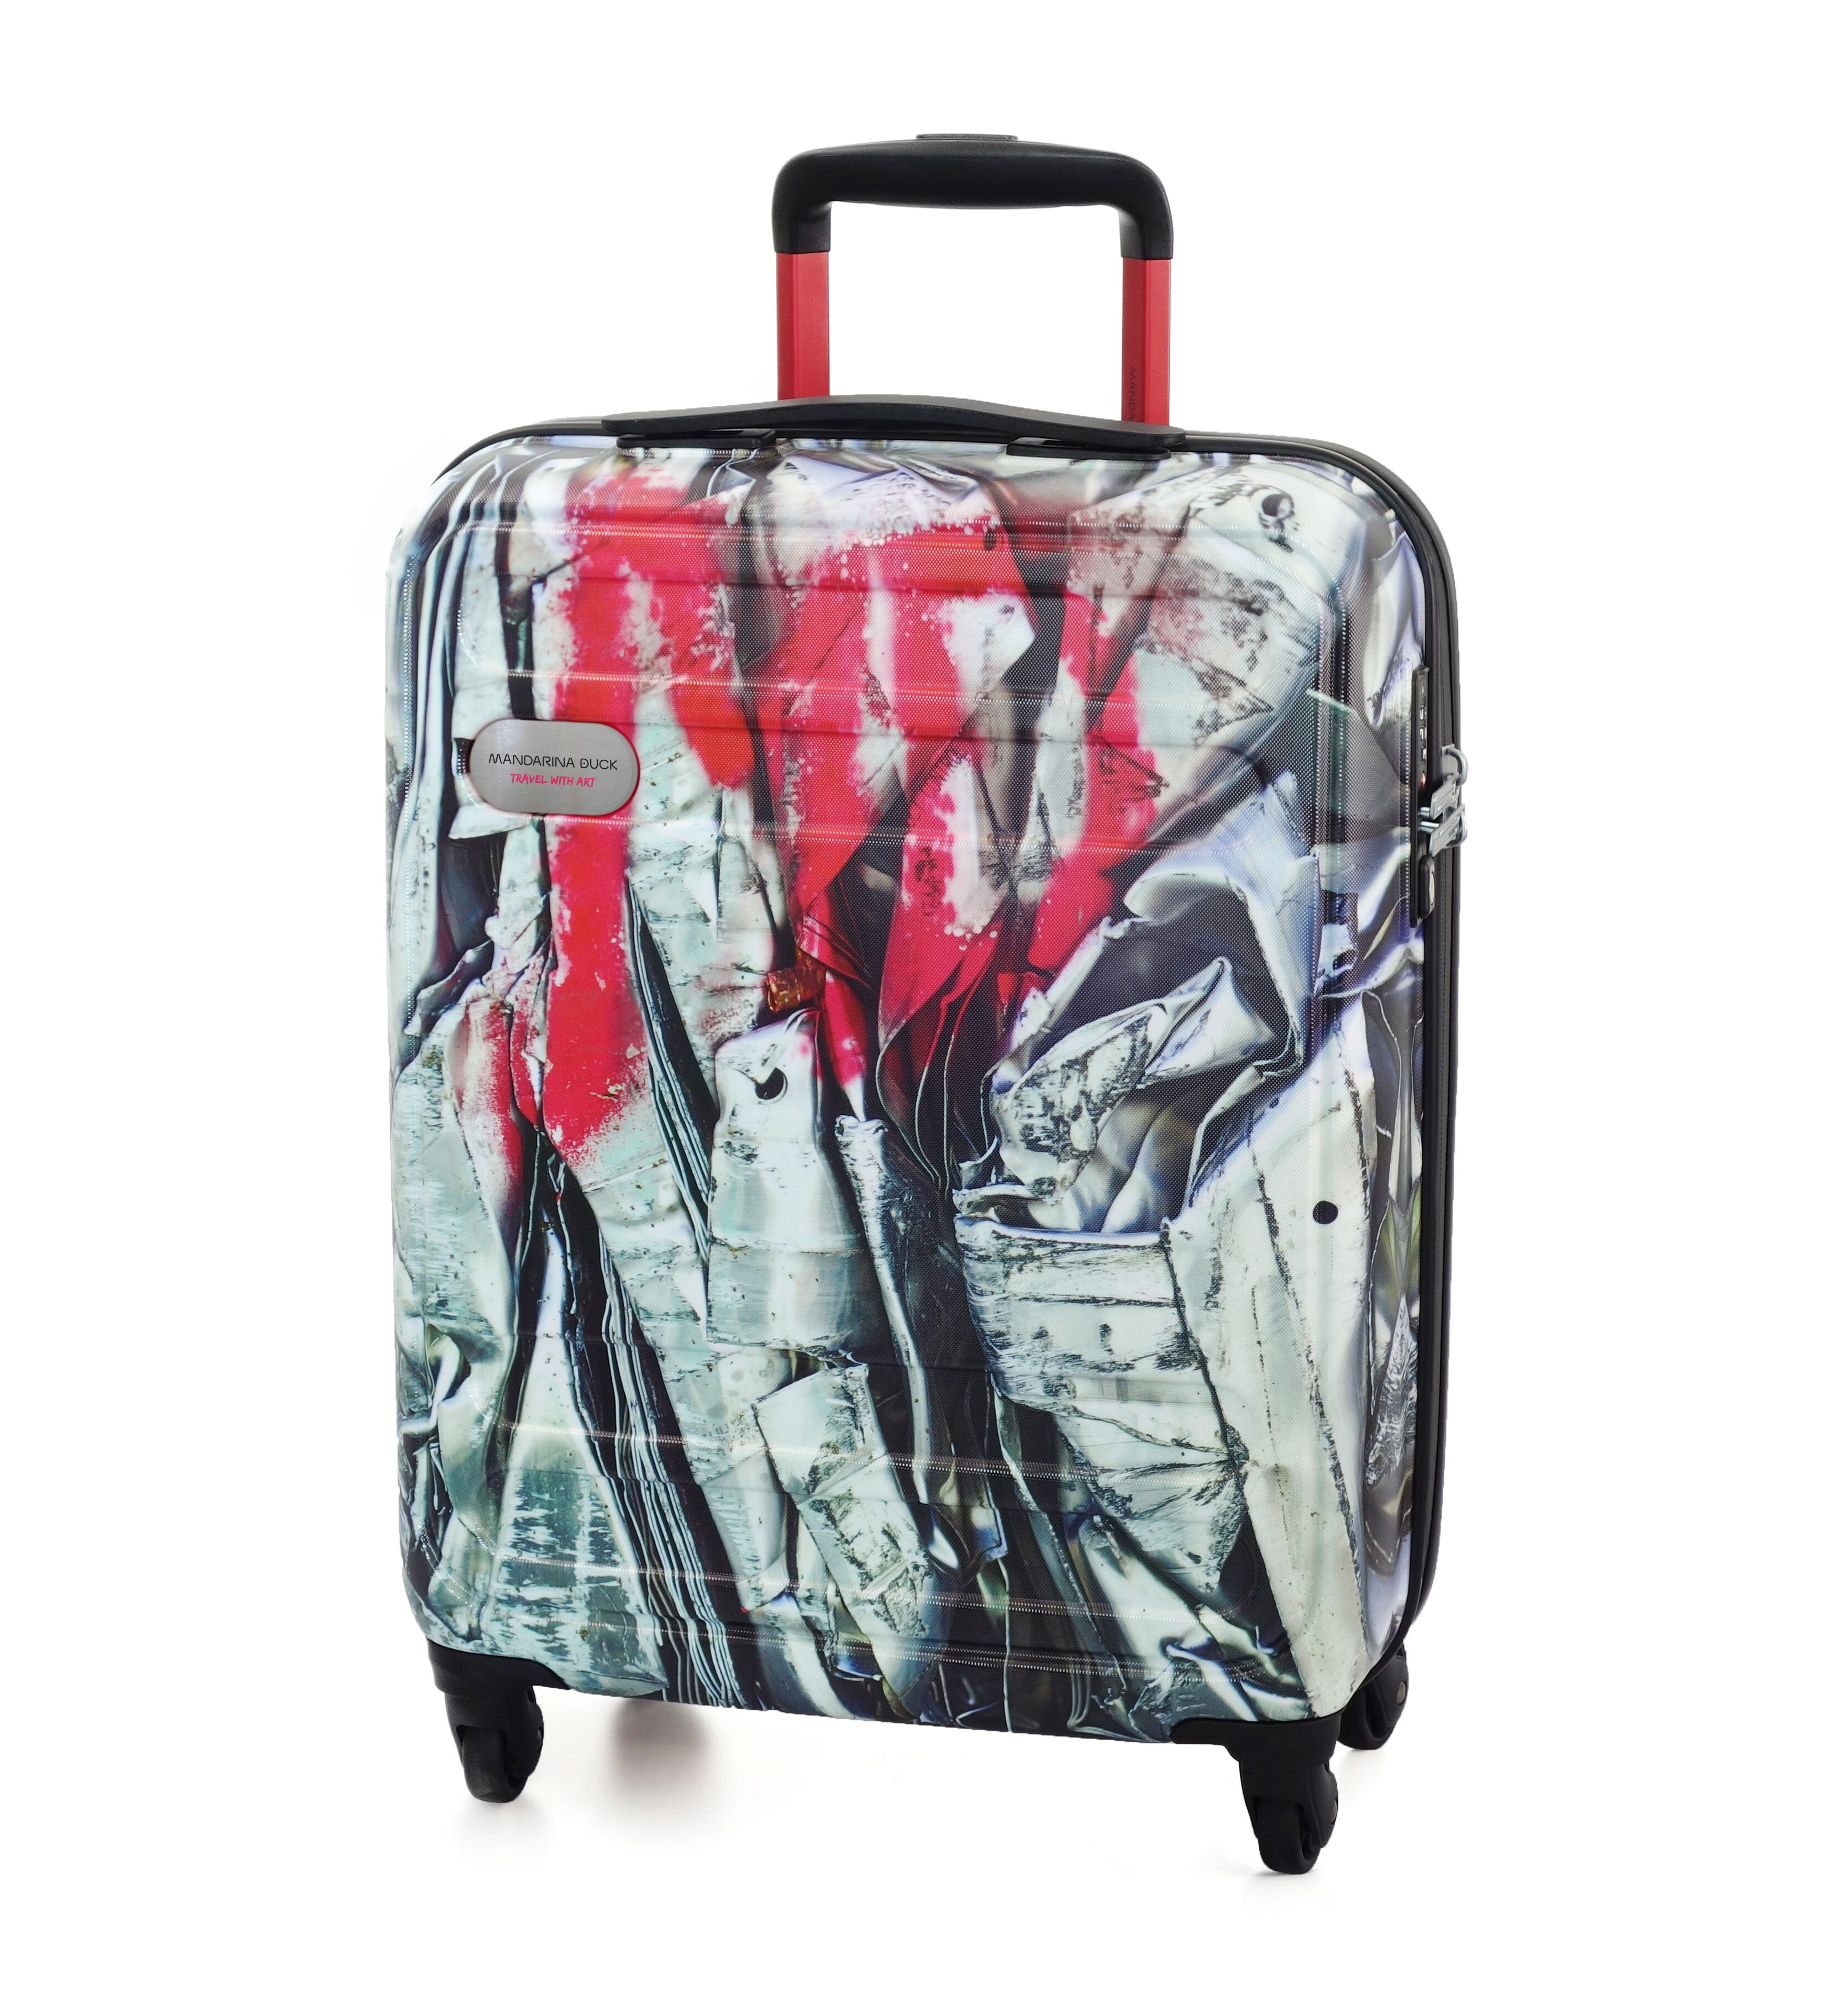 Mandarina Duck trolley travel with art